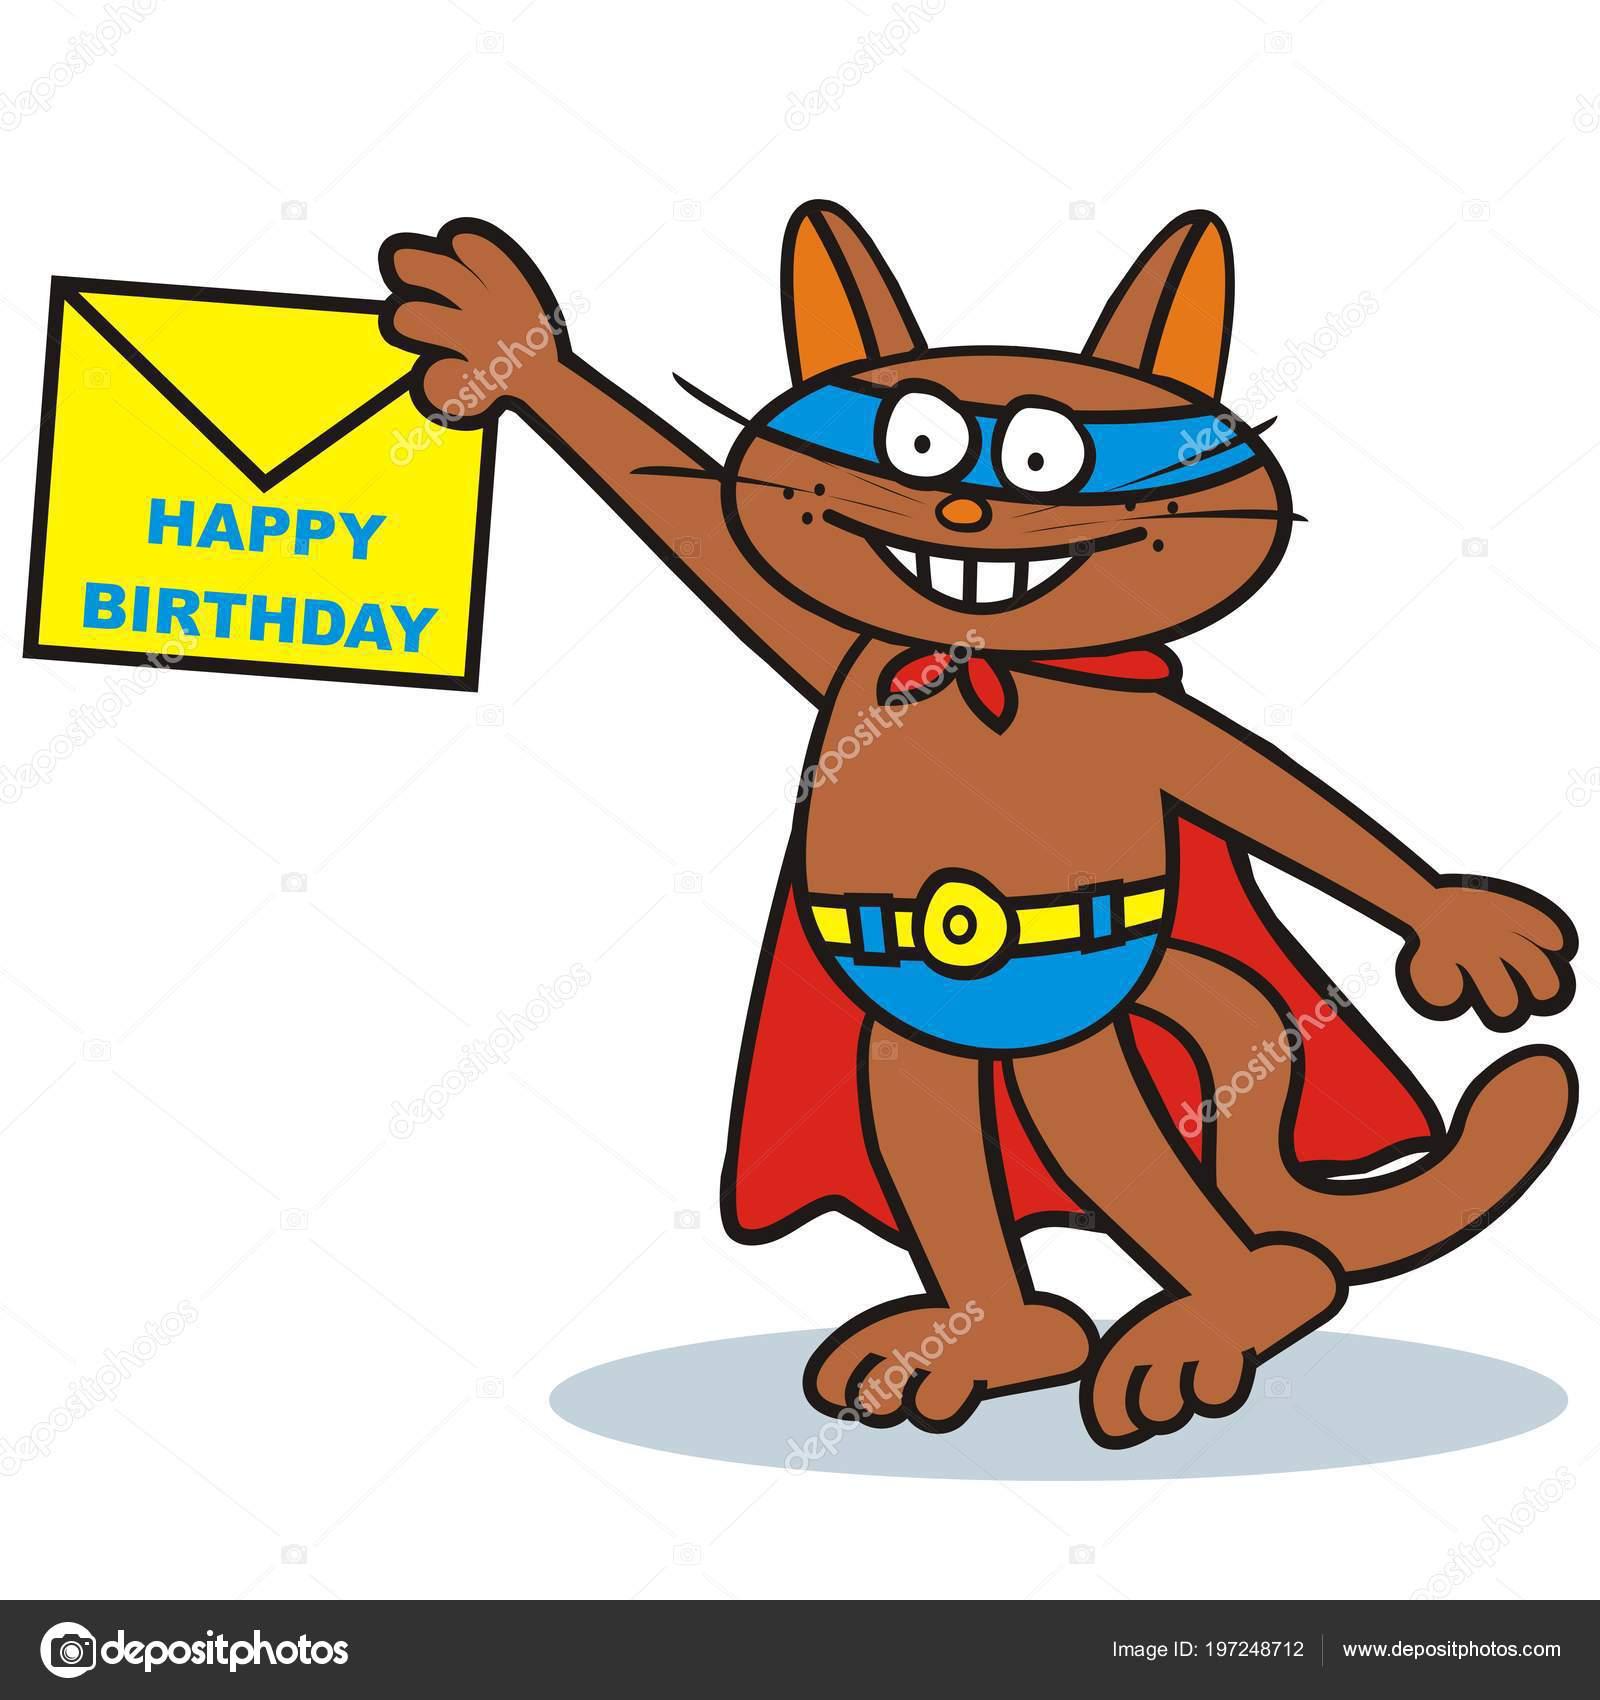 Tomcat letter felicitation funny vector illustration stock vector tomcat letter felicitation funny vector illustration stock vector altavistaventures Images